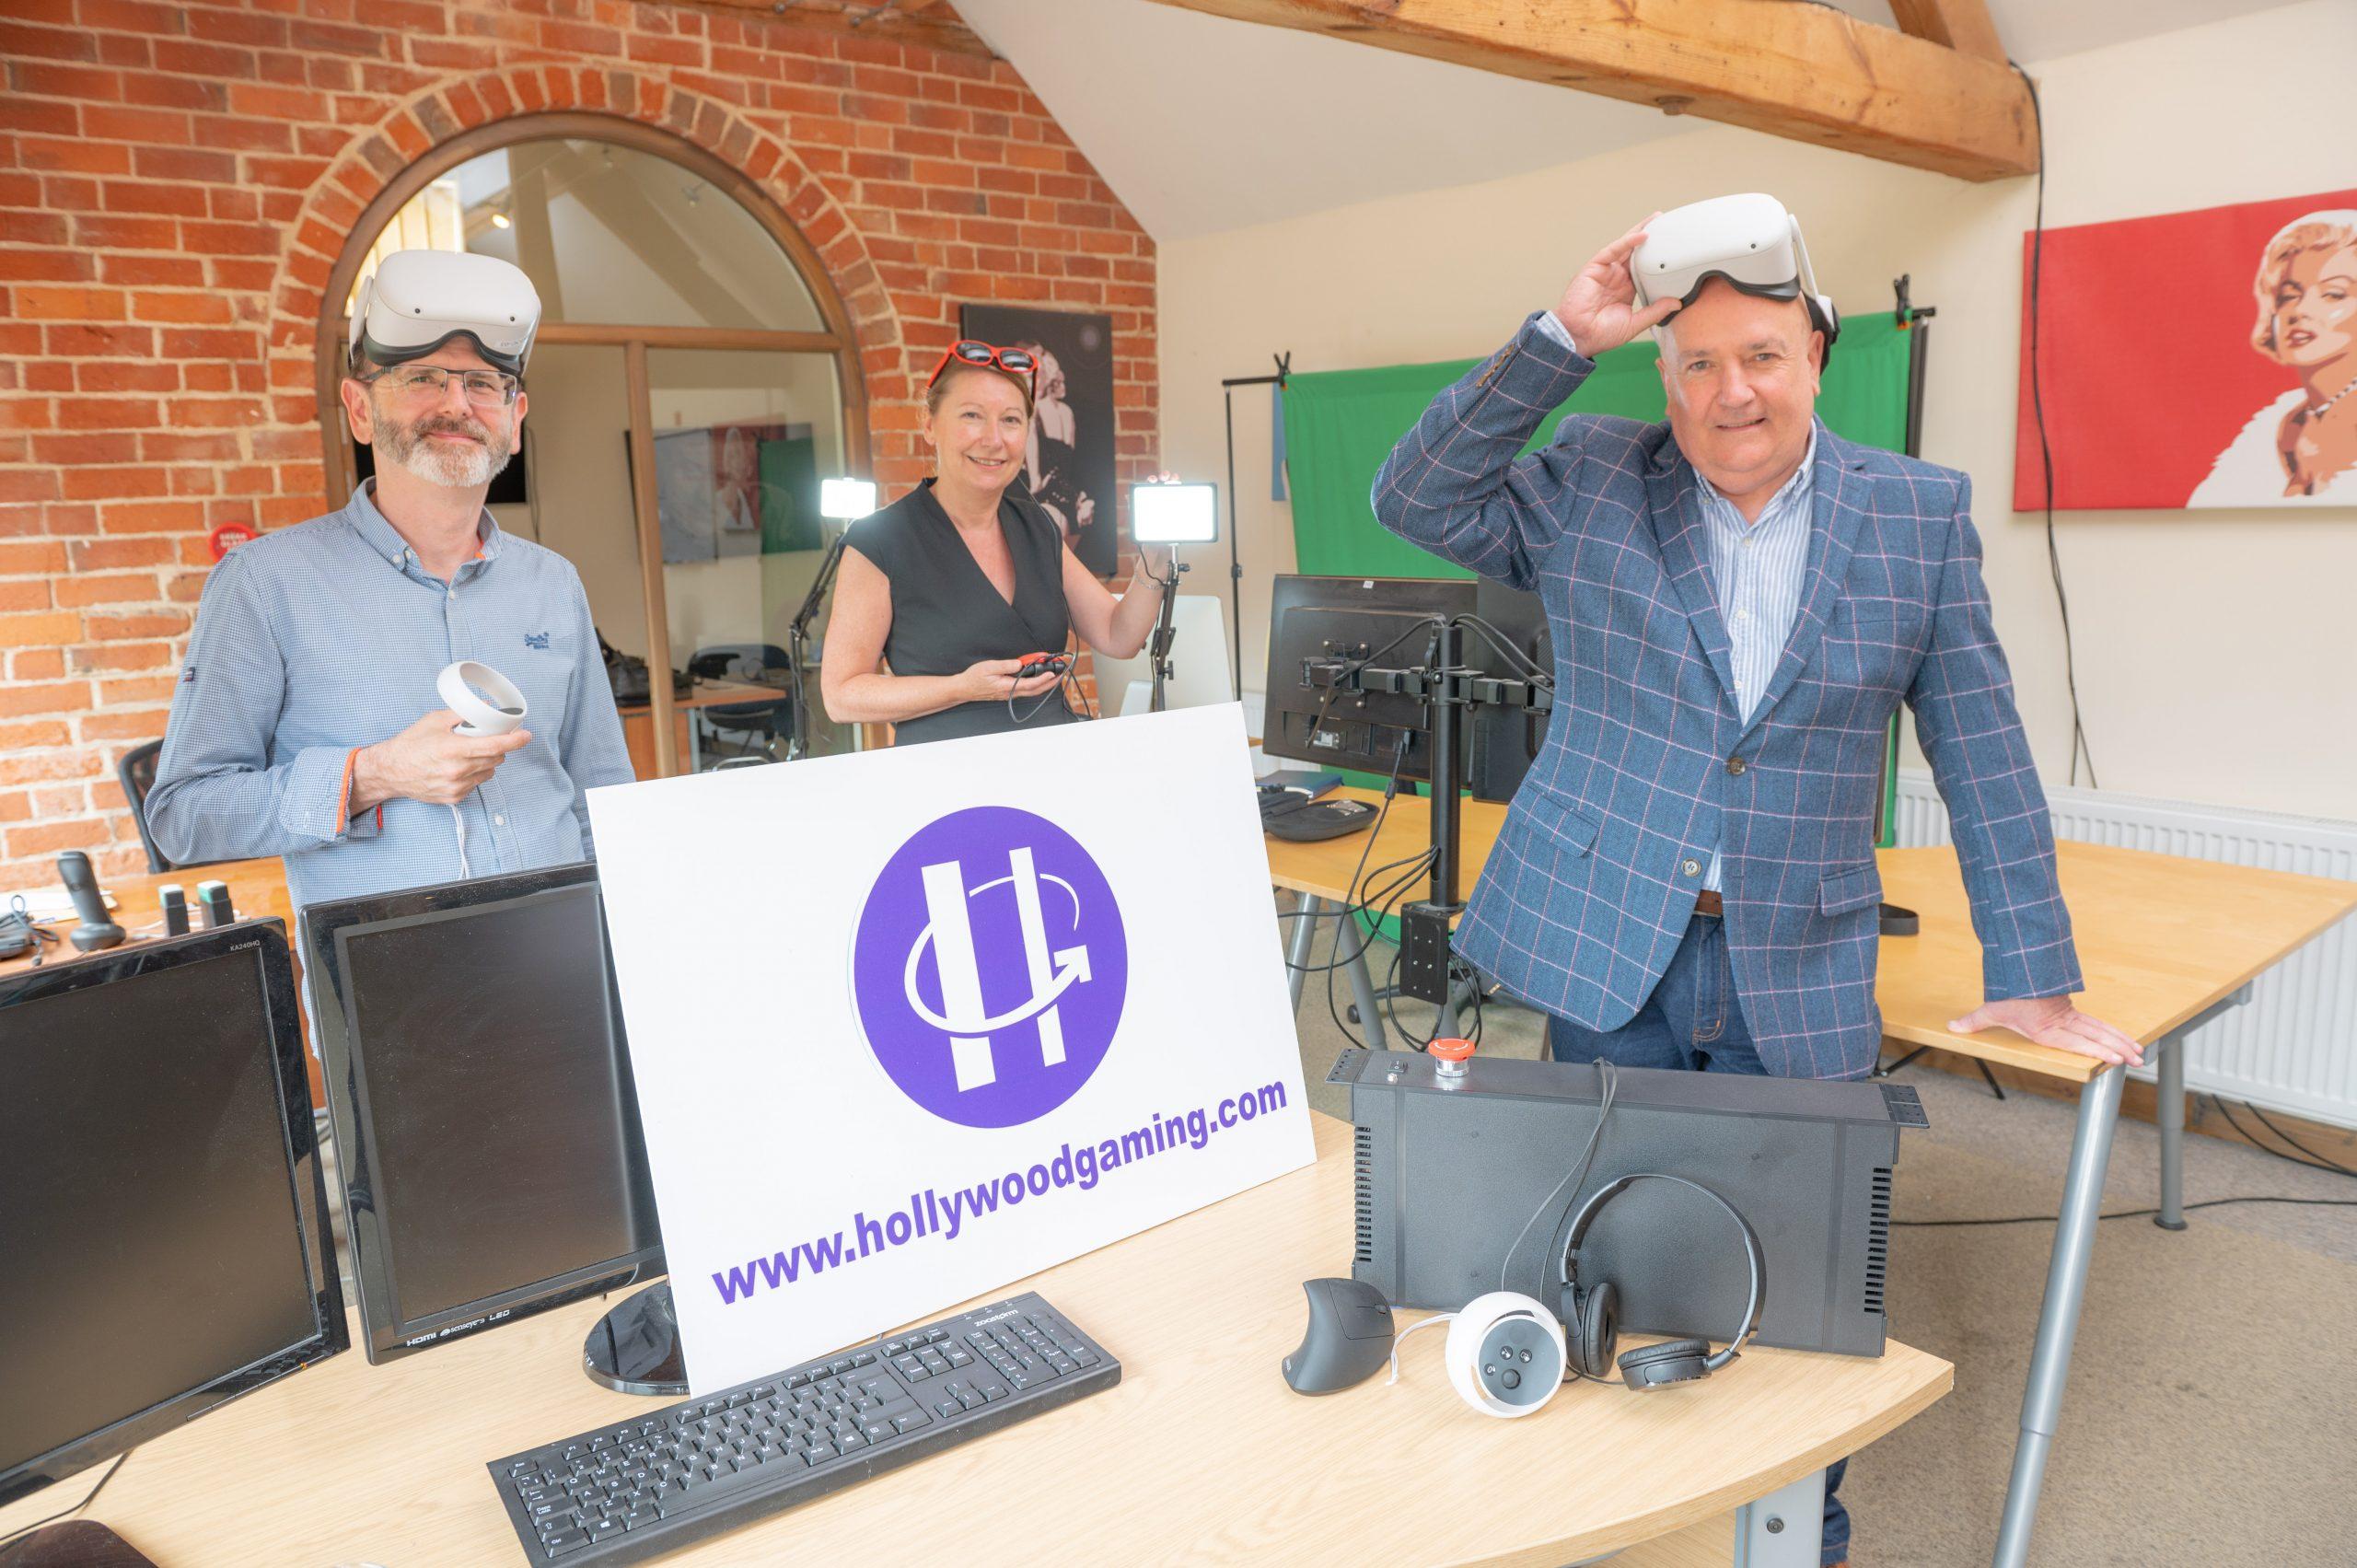 Meriden firm to raise £800k to open 'immersive experiences' venue